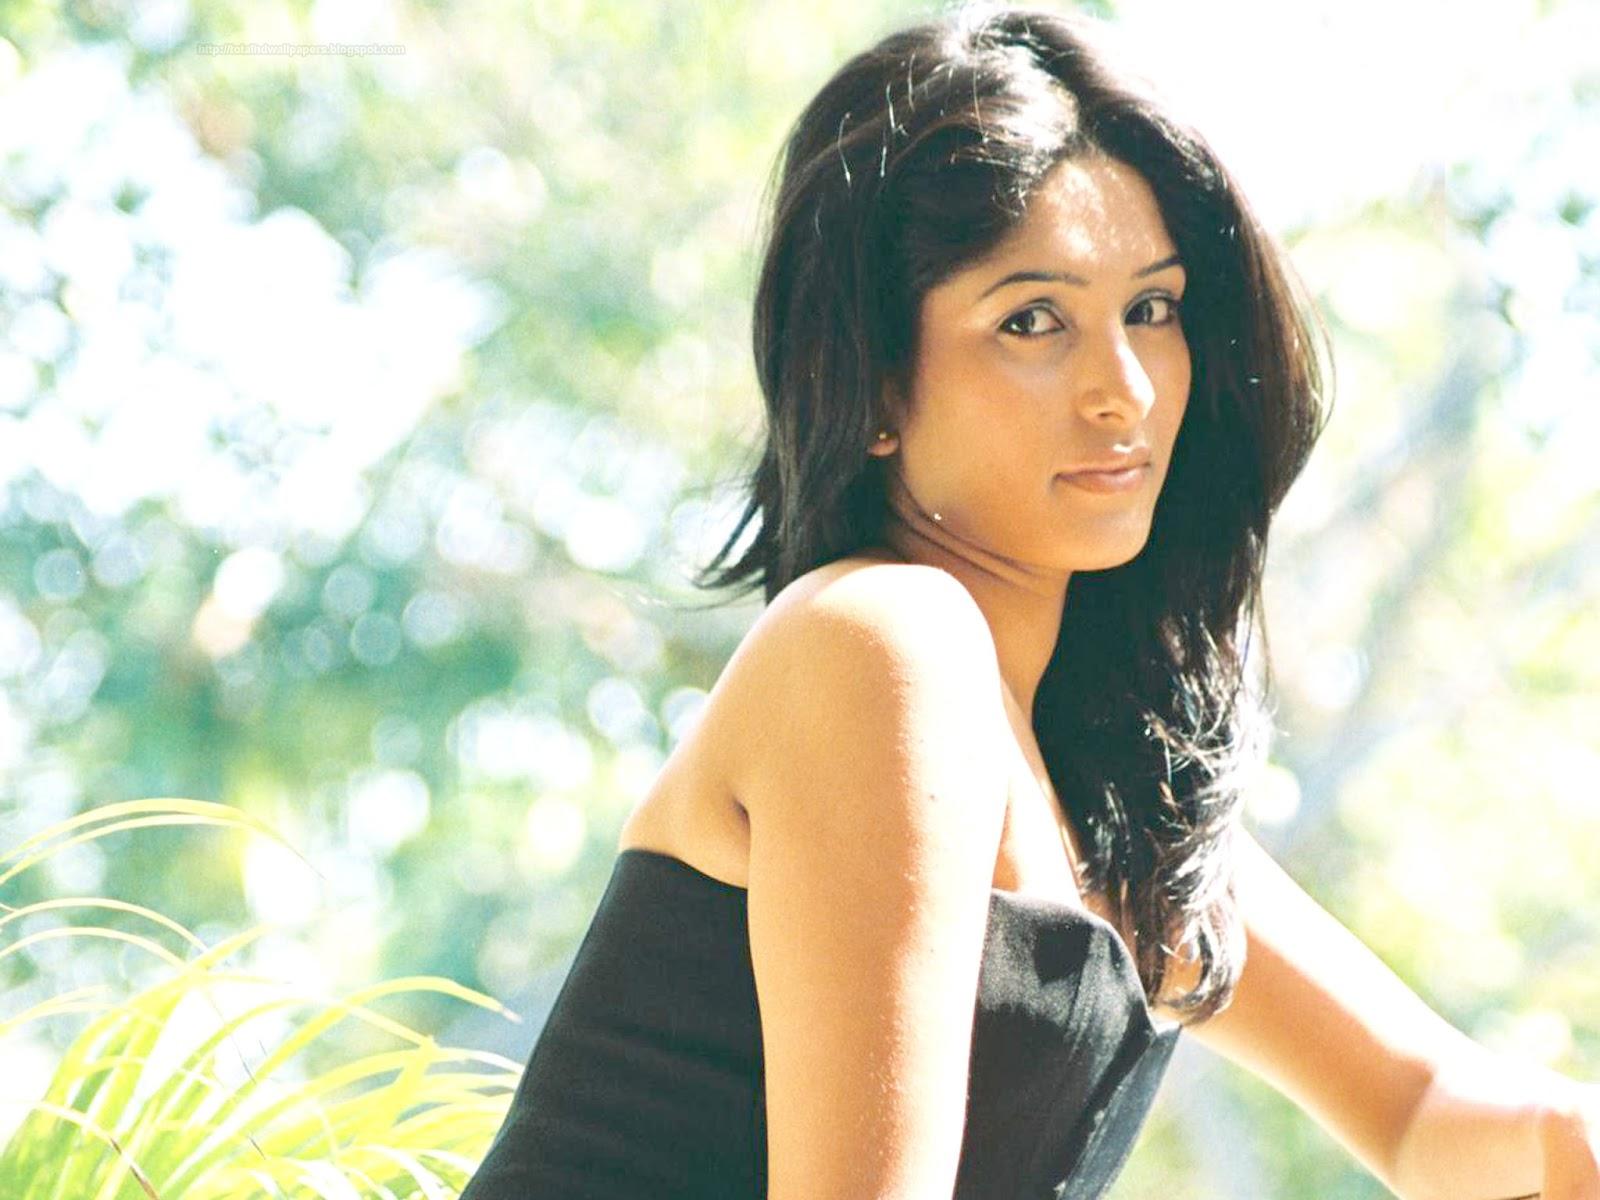 Bollywood Actress Hd Wallpapers Hollywood Actress Hd: Totall All Bollywood & Hollywood Actress HD Wallpapers